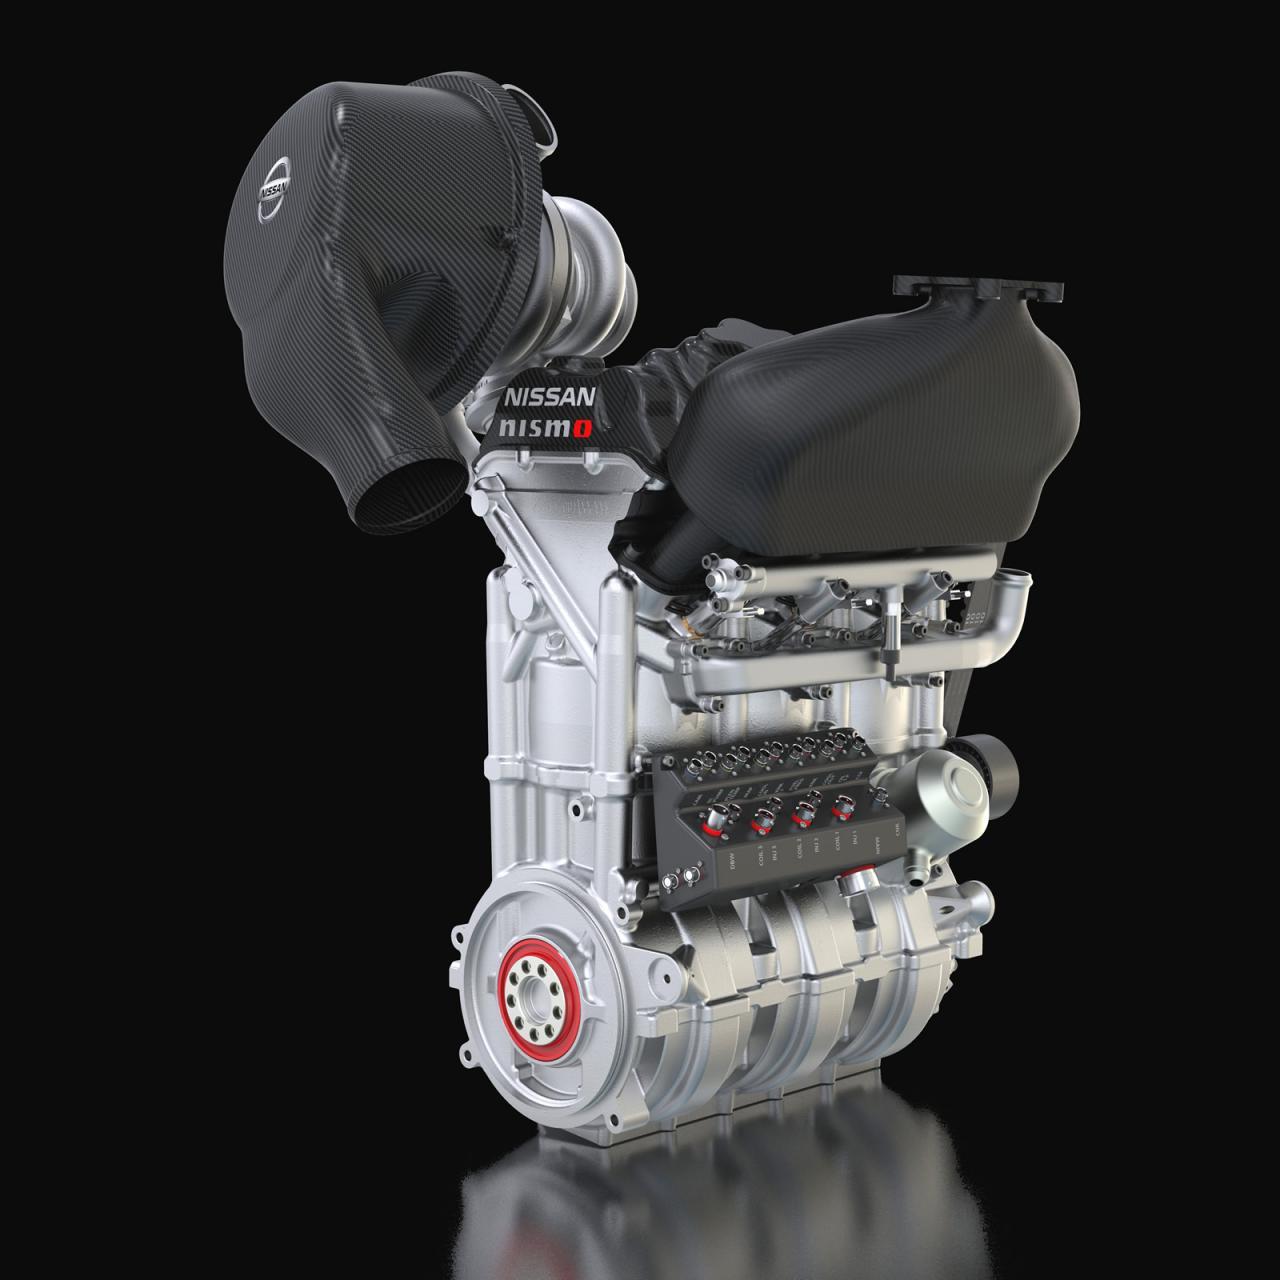 nissan dig t r 1 5 litre 3cyl turbo packs 298kw performancedrive. Black Bedroom Furniture Sets. Home Design Ideas